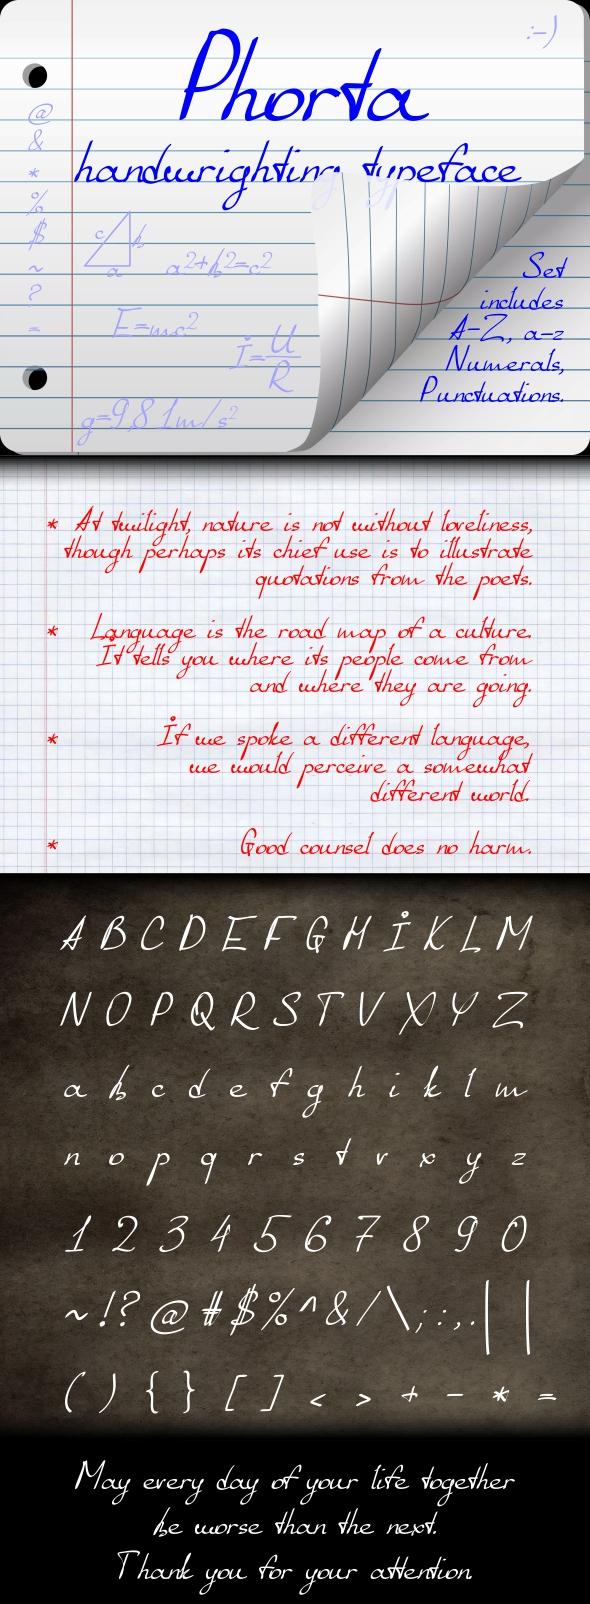 Phorta (handwrighting typeface) - Hand-writing Script